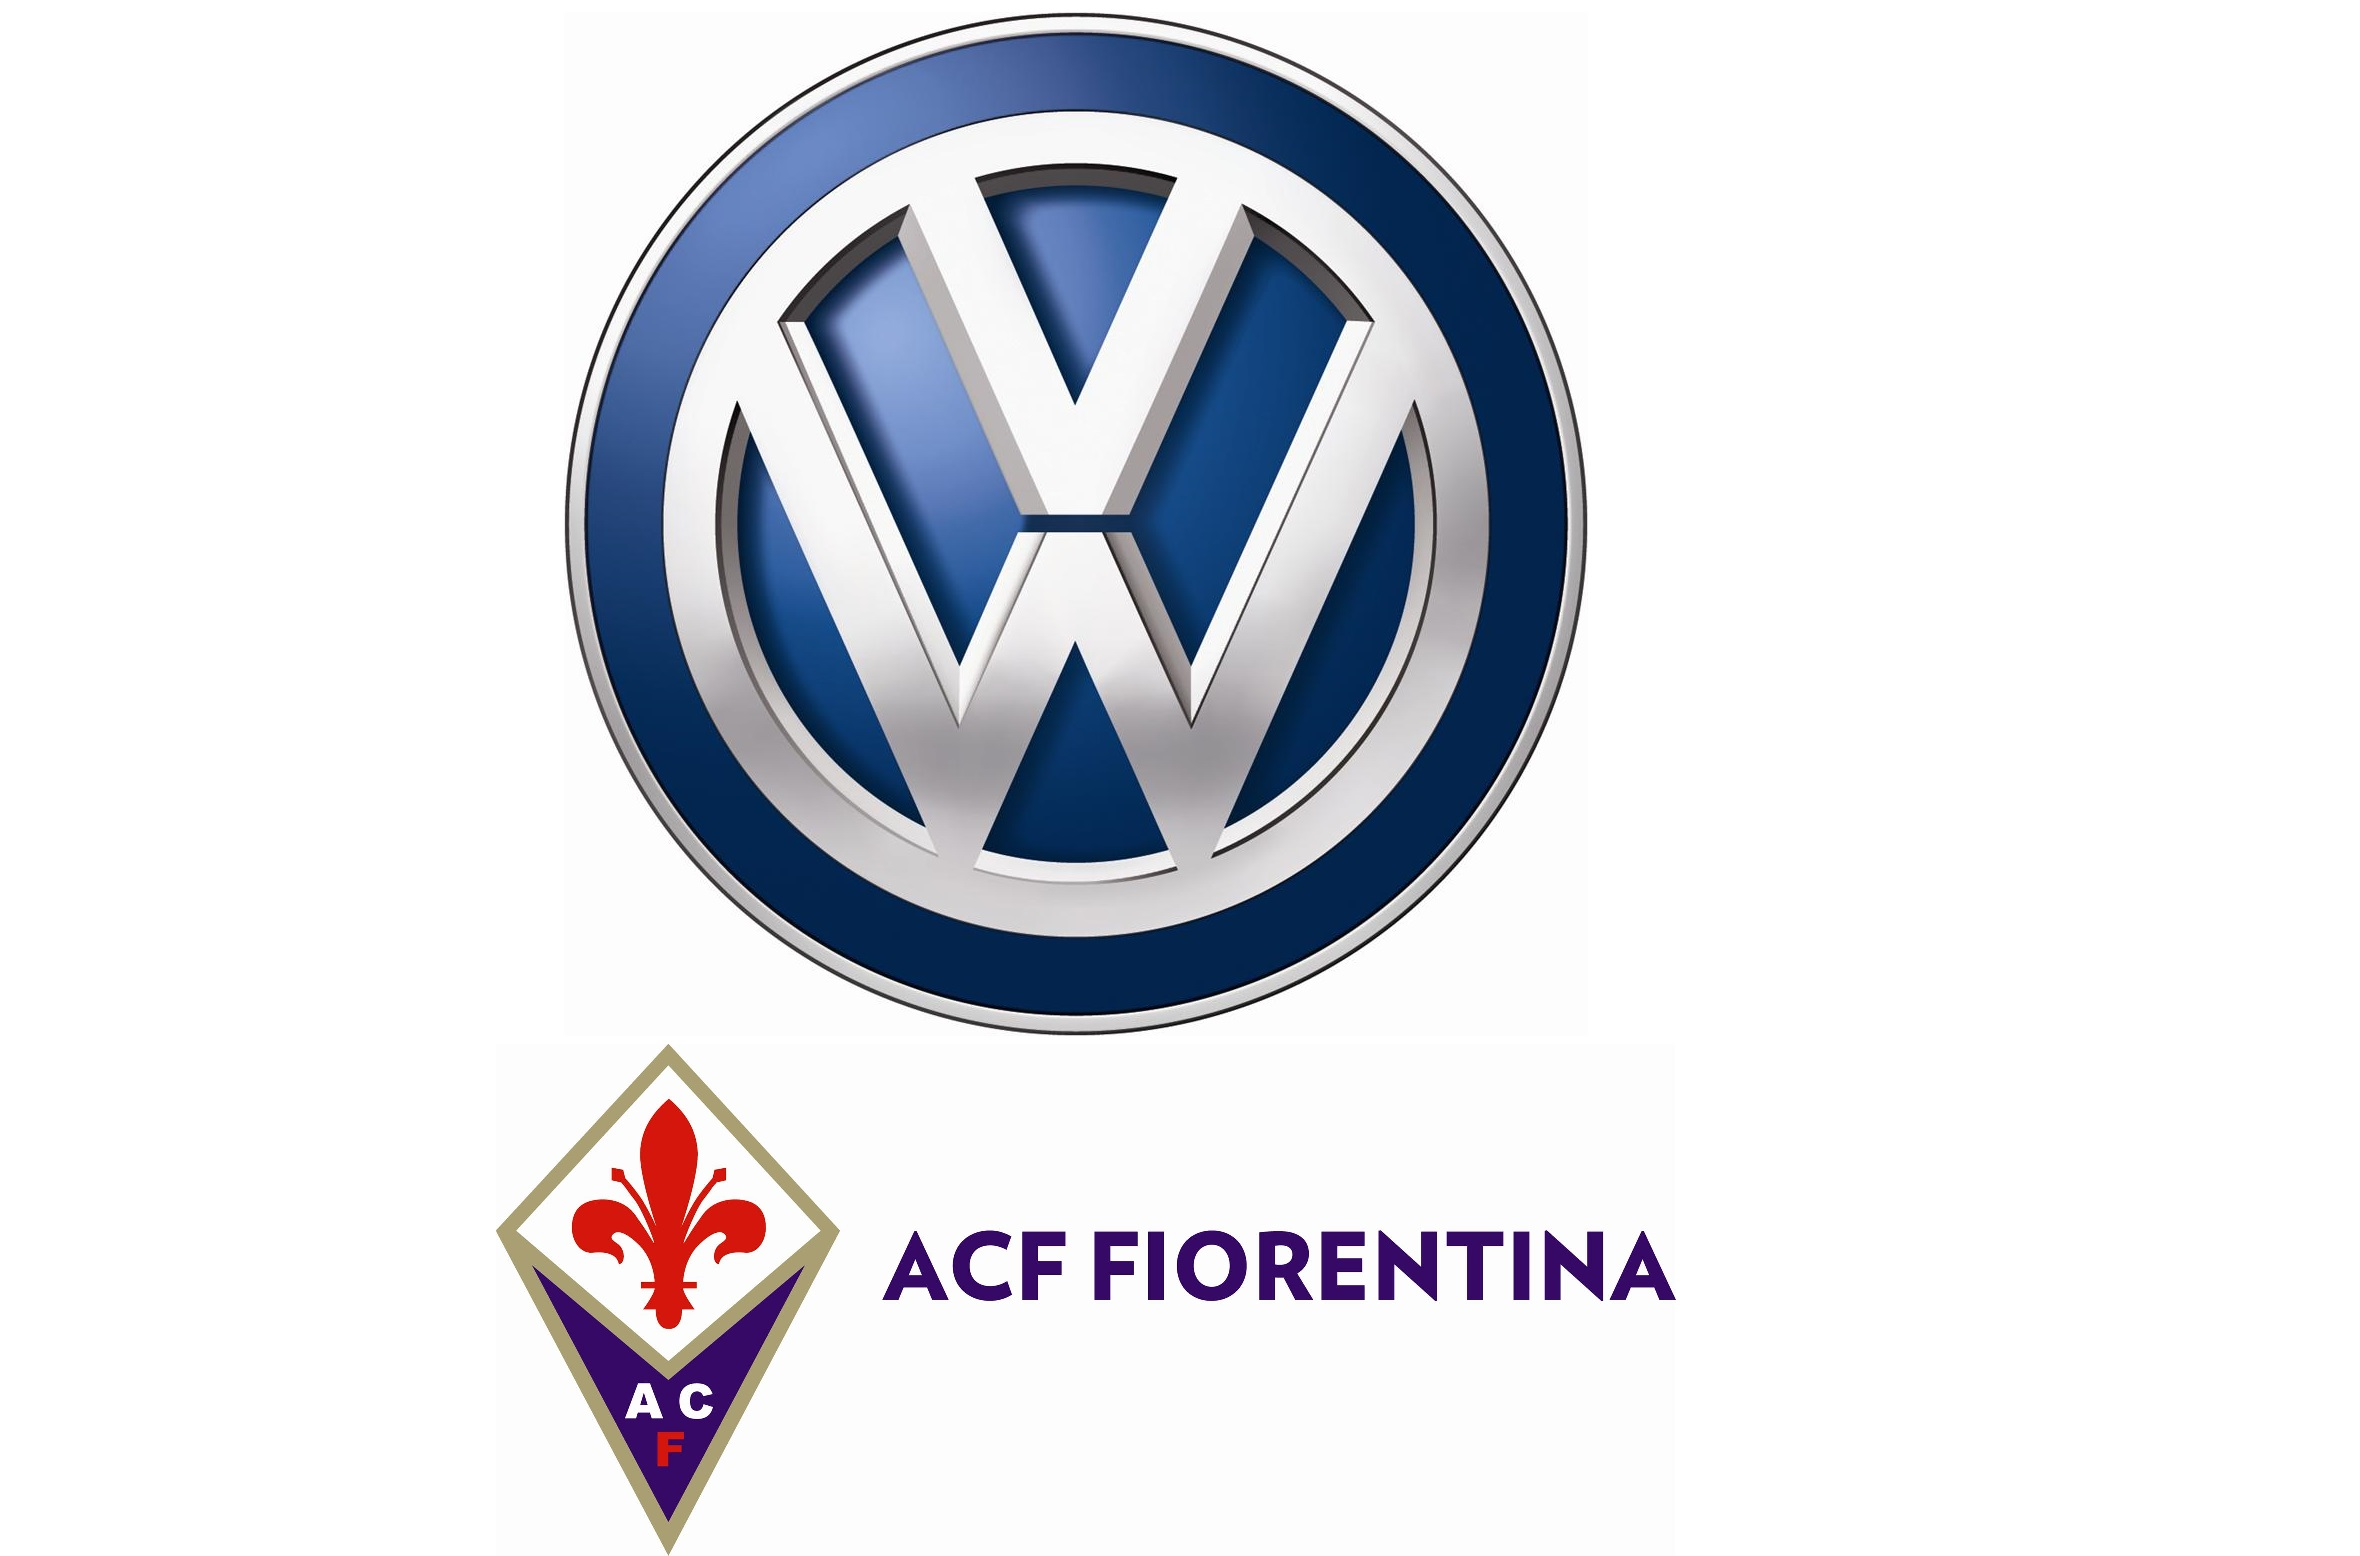 VW partner di ACF Fiorentina